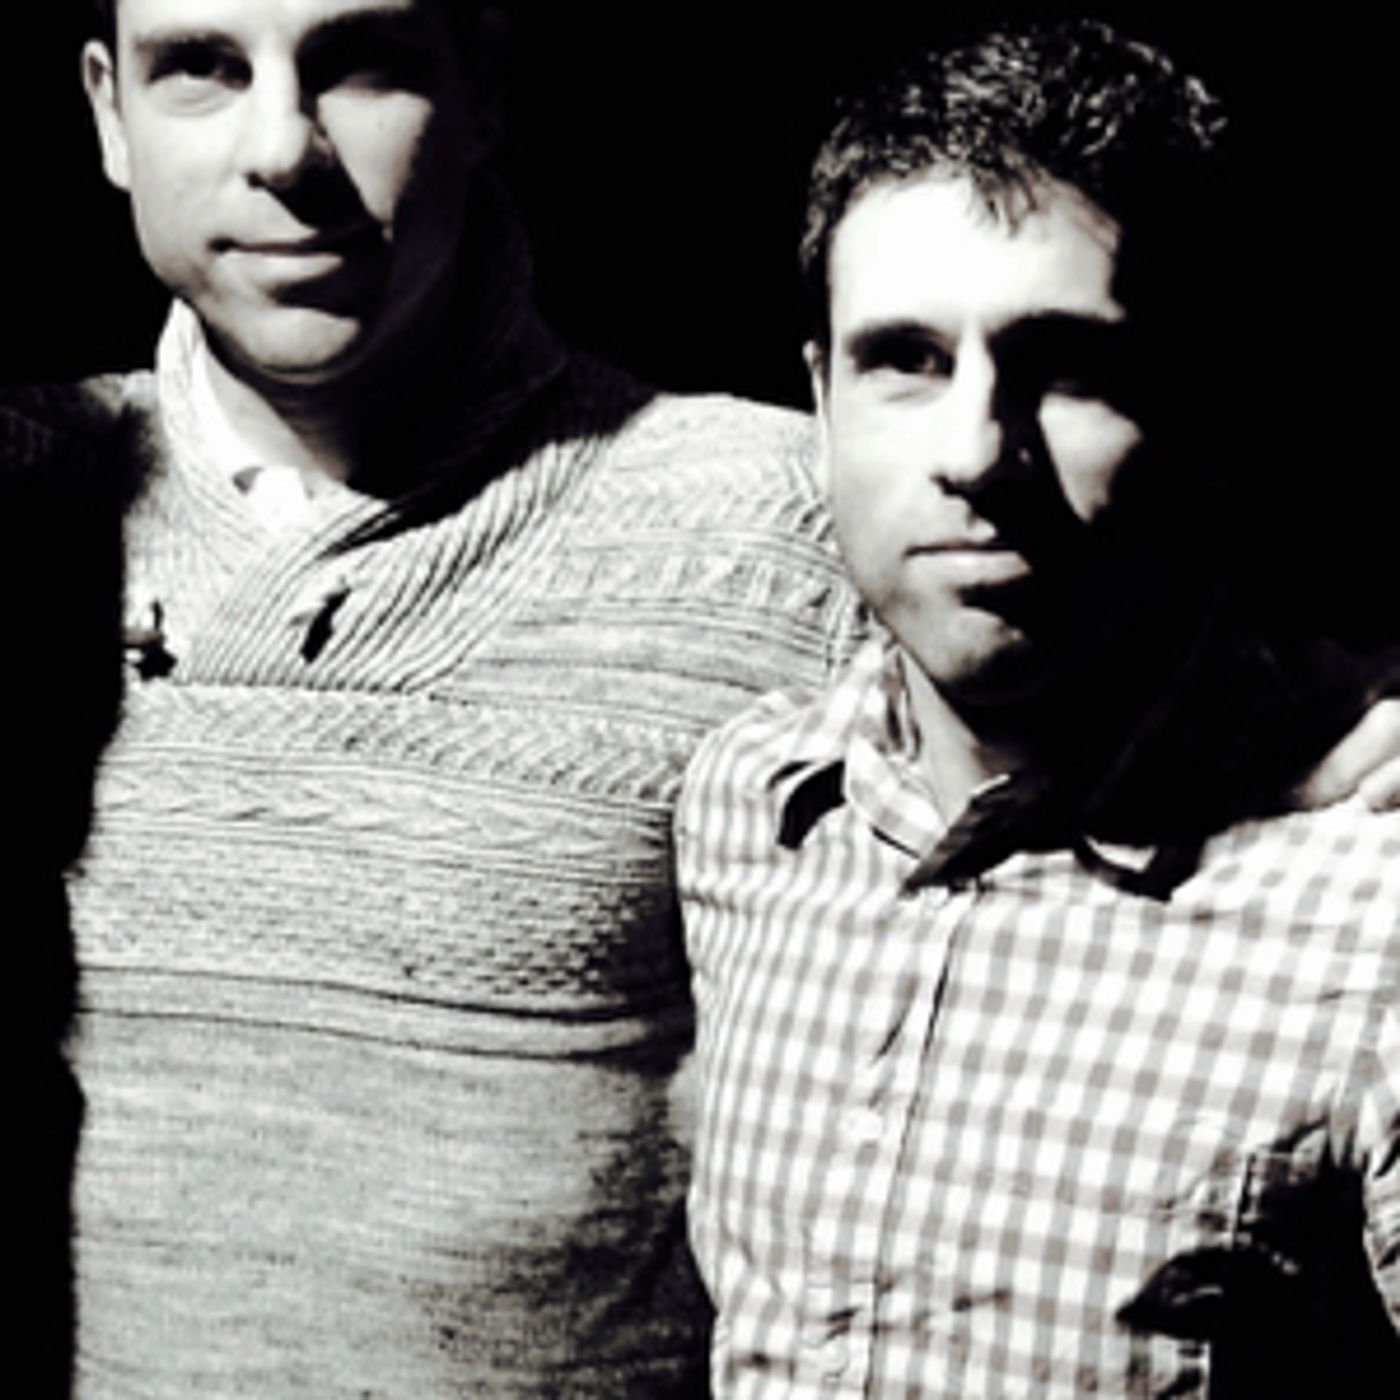 #53 The Brothers Shammasian